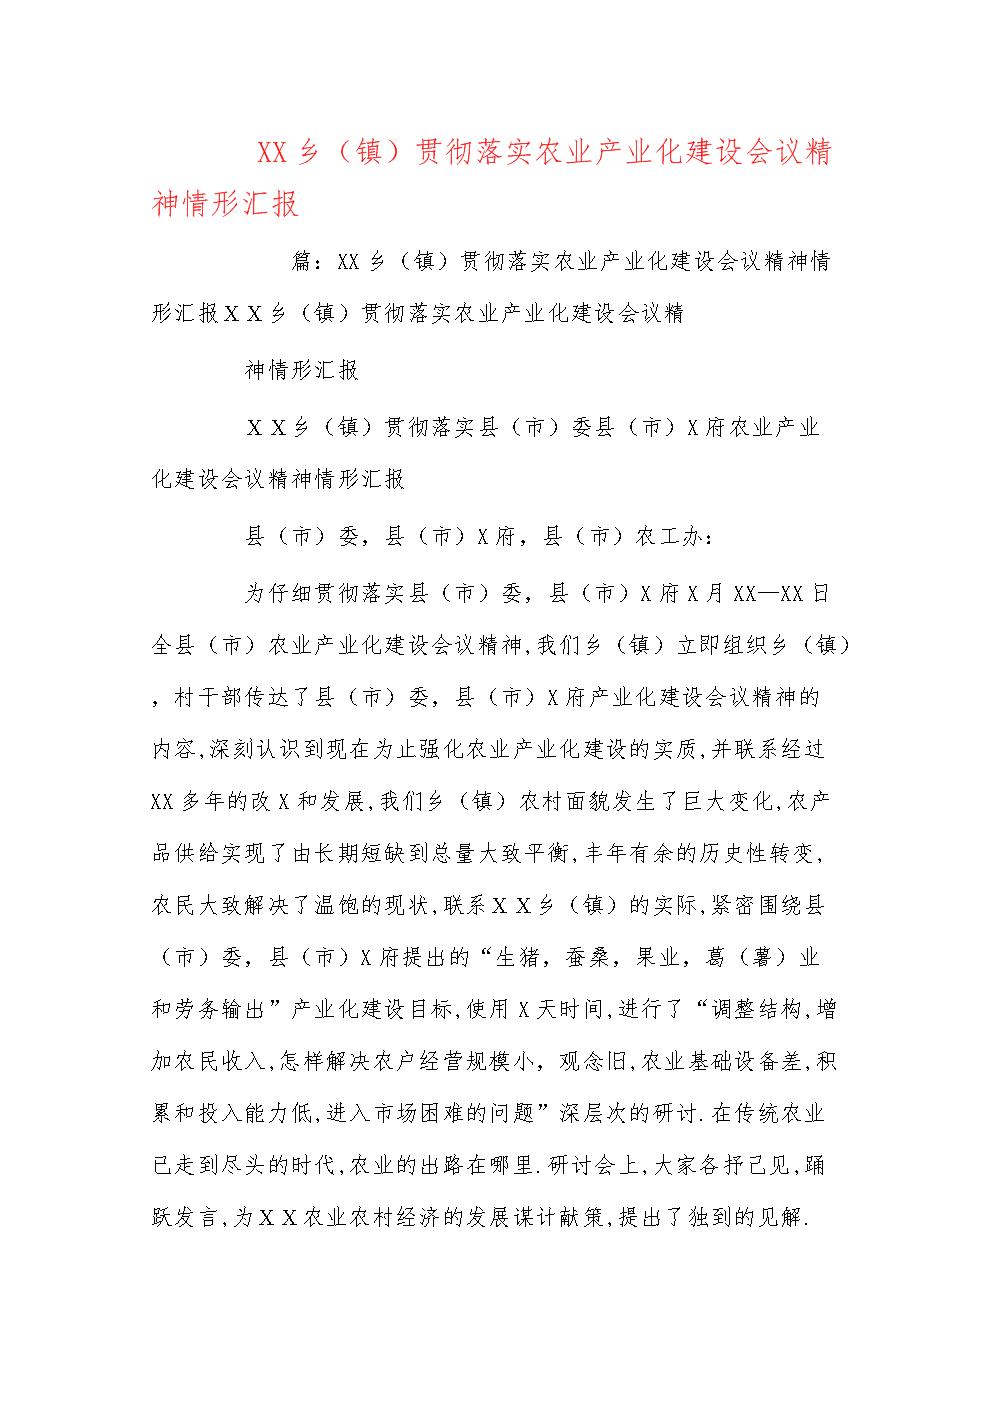 XX乡贯彻落实农业产业化建设会议精神情况汇报.doc